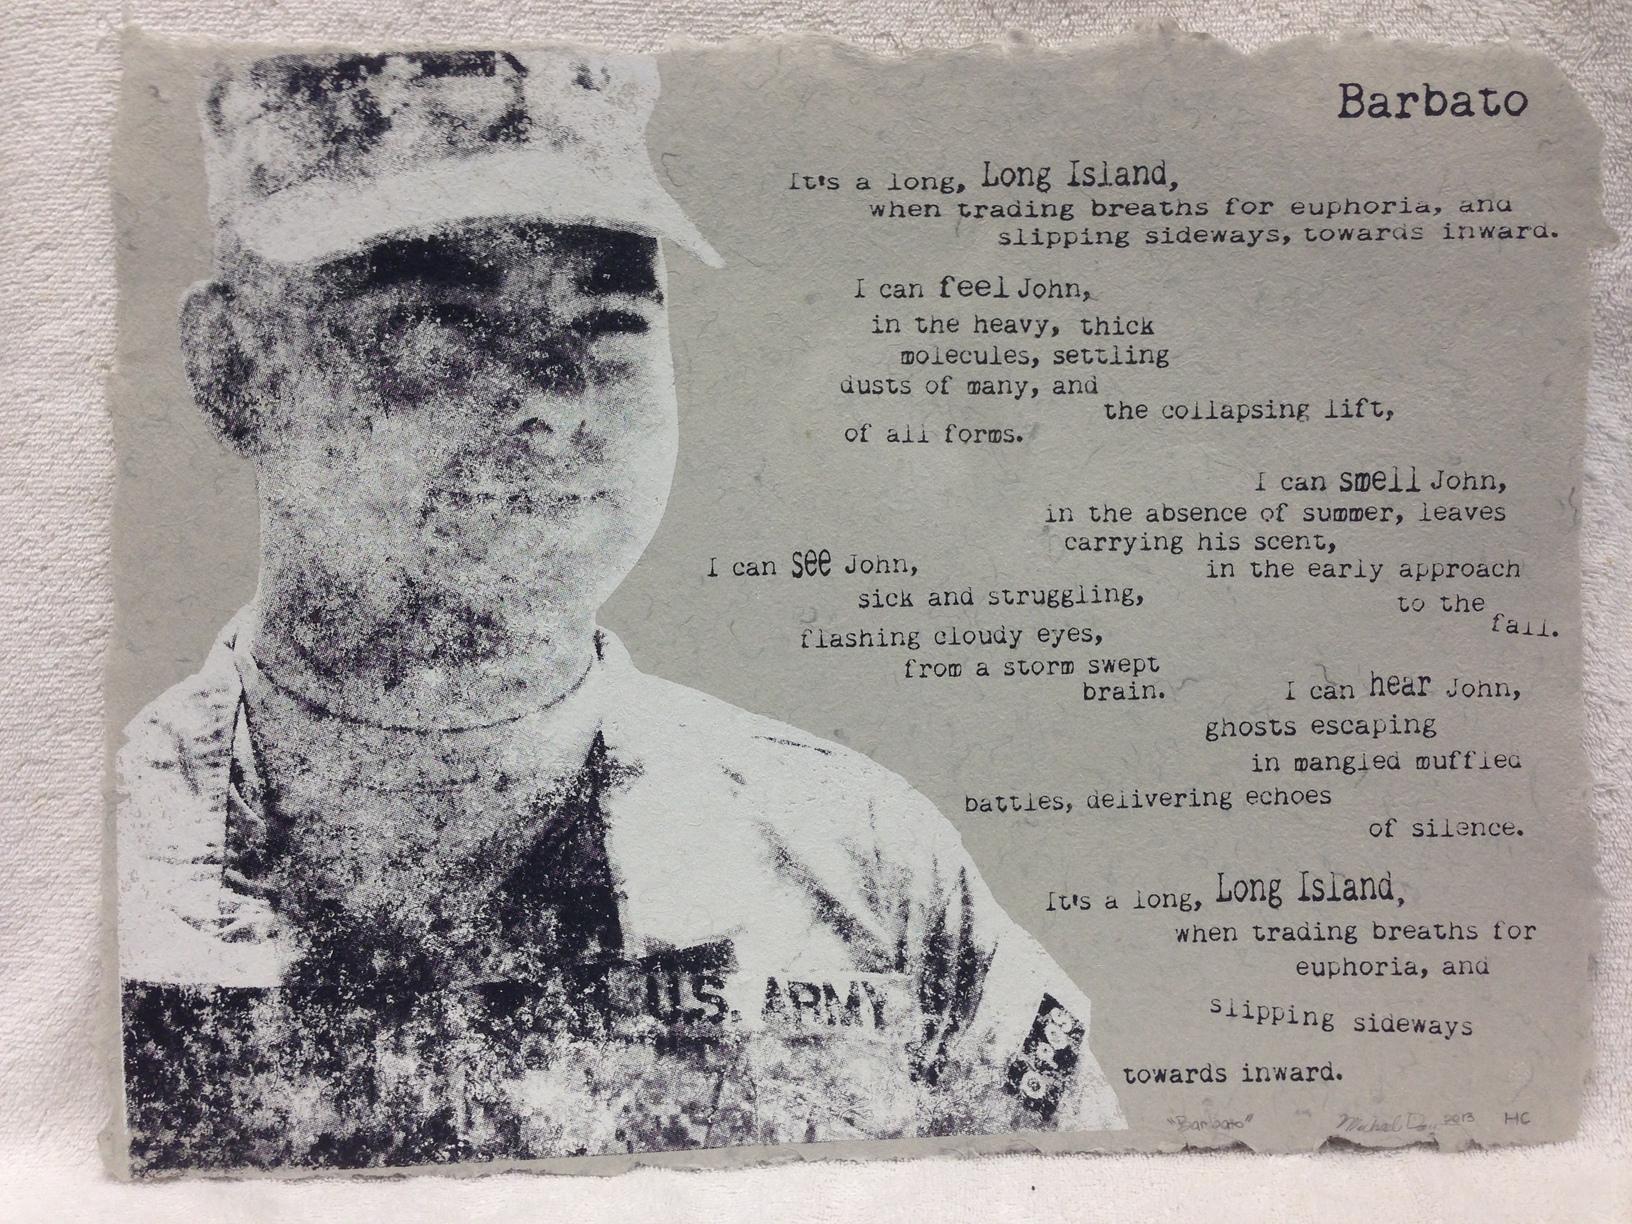 Michael Day Marines - Iraq _Barbato_ 2013 Silkscreen on Handmade Paper from military uniforms 12 x 18 PCNJ Weekly Workshop IMG_0964JPG.jpg